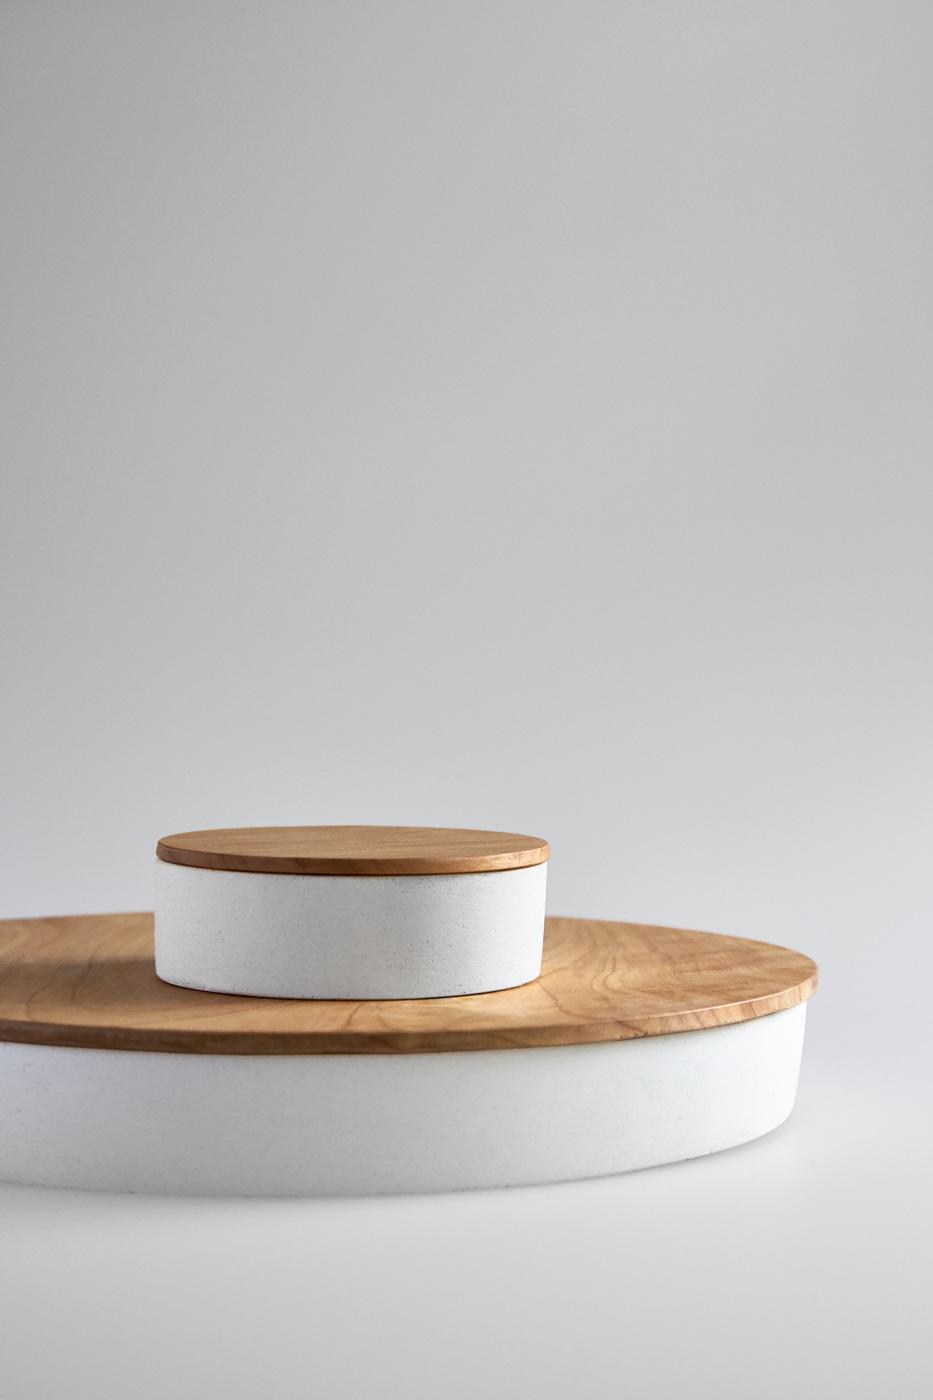 White Small Round Concrete Container Studiokyss